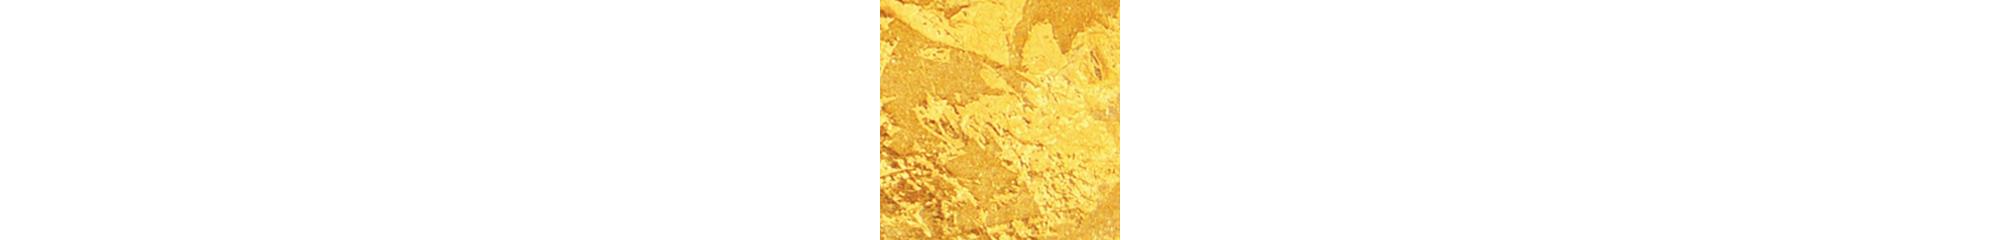 tmm_sp_premenstrual_moon.png